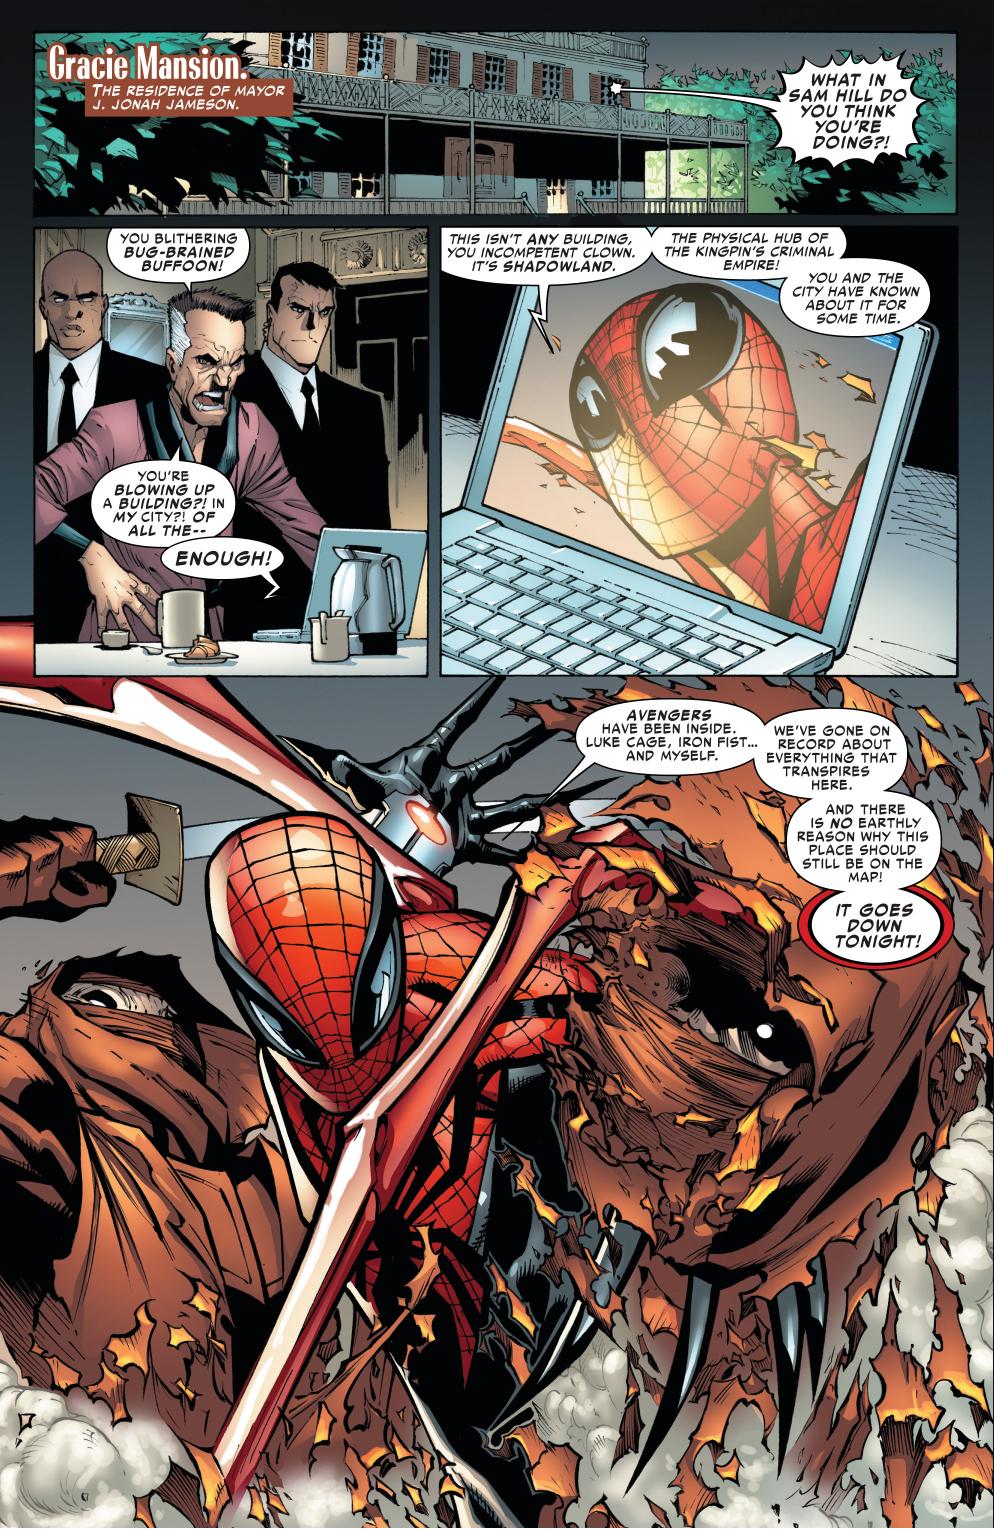 Jonah jameson quotes quotesgram - Superior Spider Man Blackmails Jonah Jameson Again